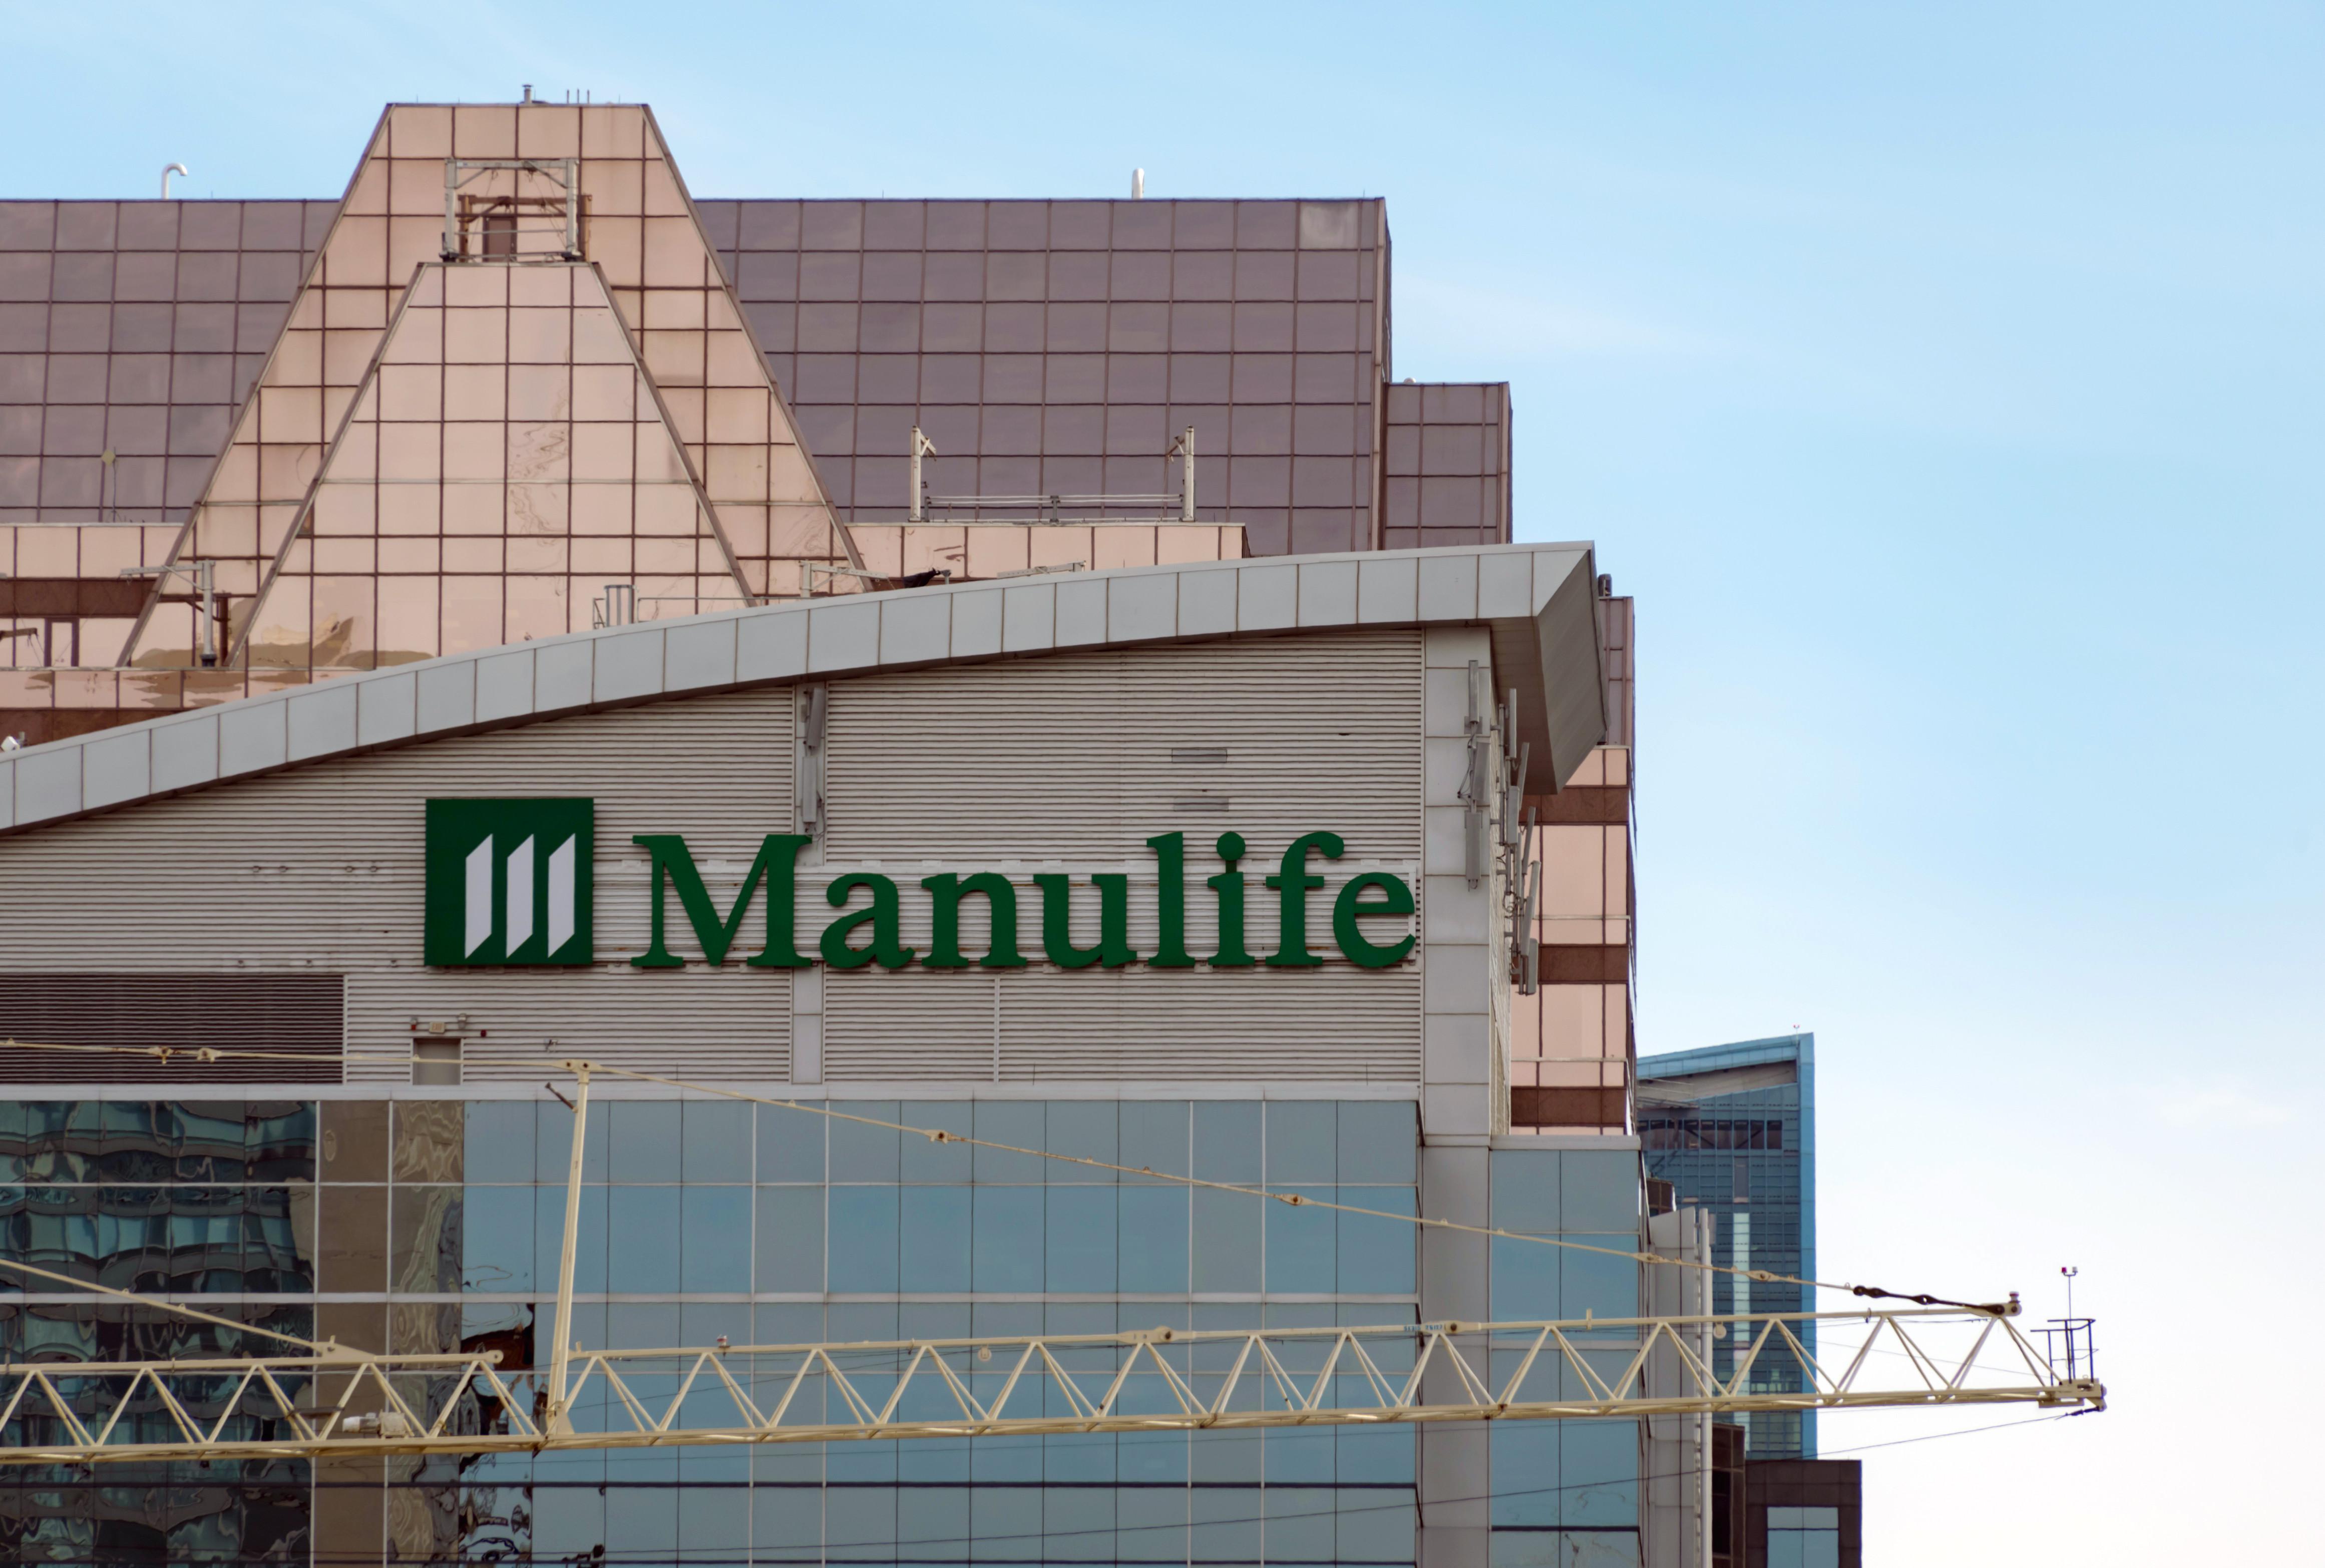 manulife financial building